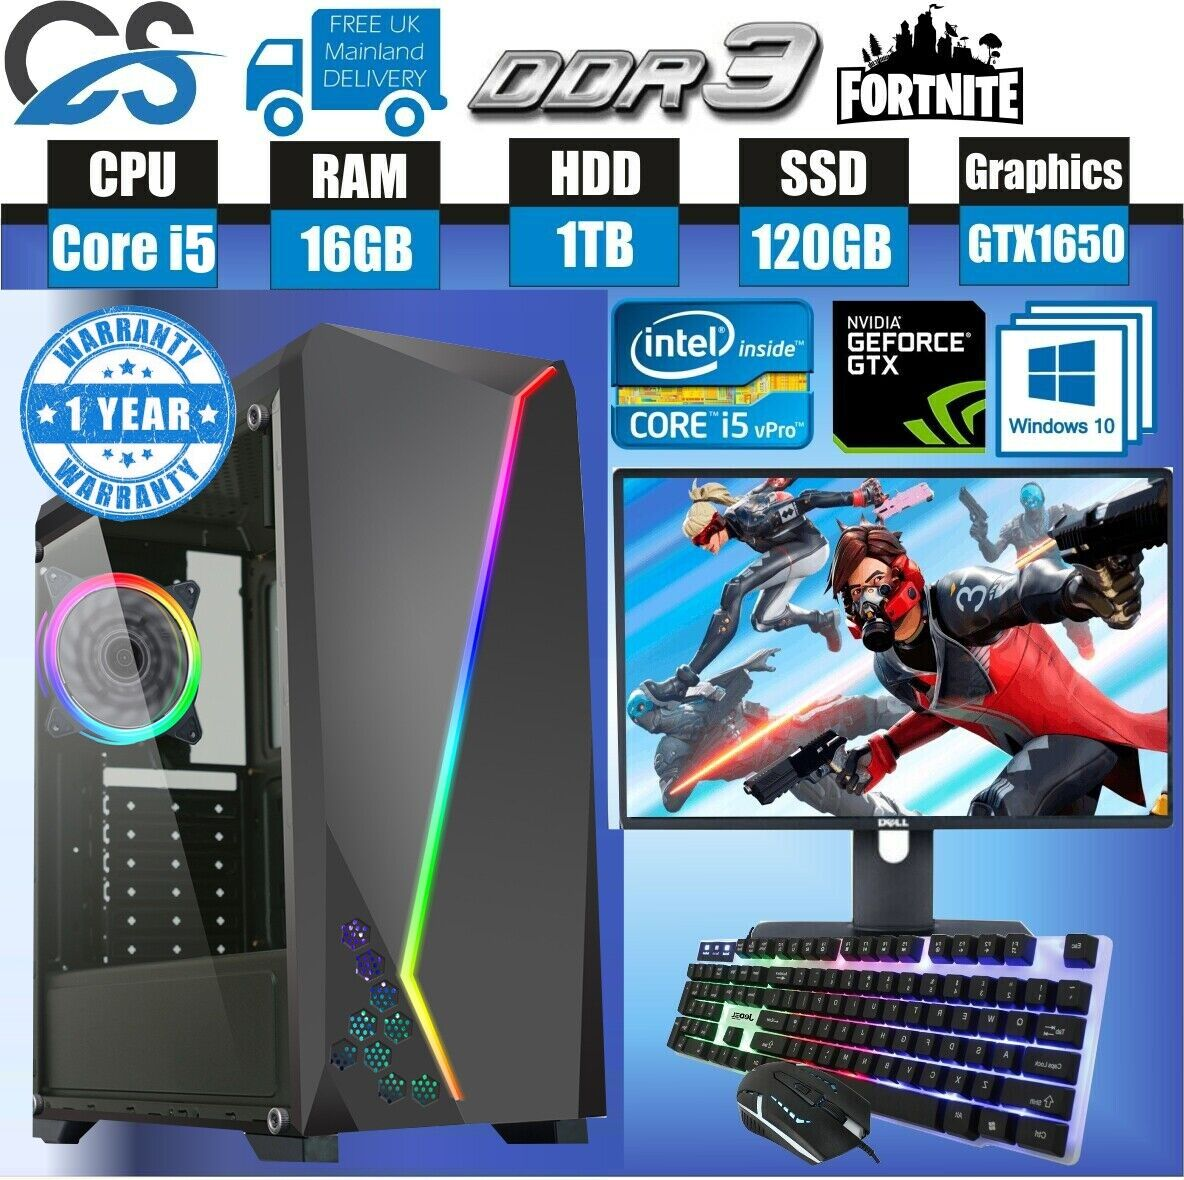 Computer Games - Fast Gaming PC Computer Bundle Intel Quad Core i5 16GB 1TB 128GB 4GB GTX1650 W10